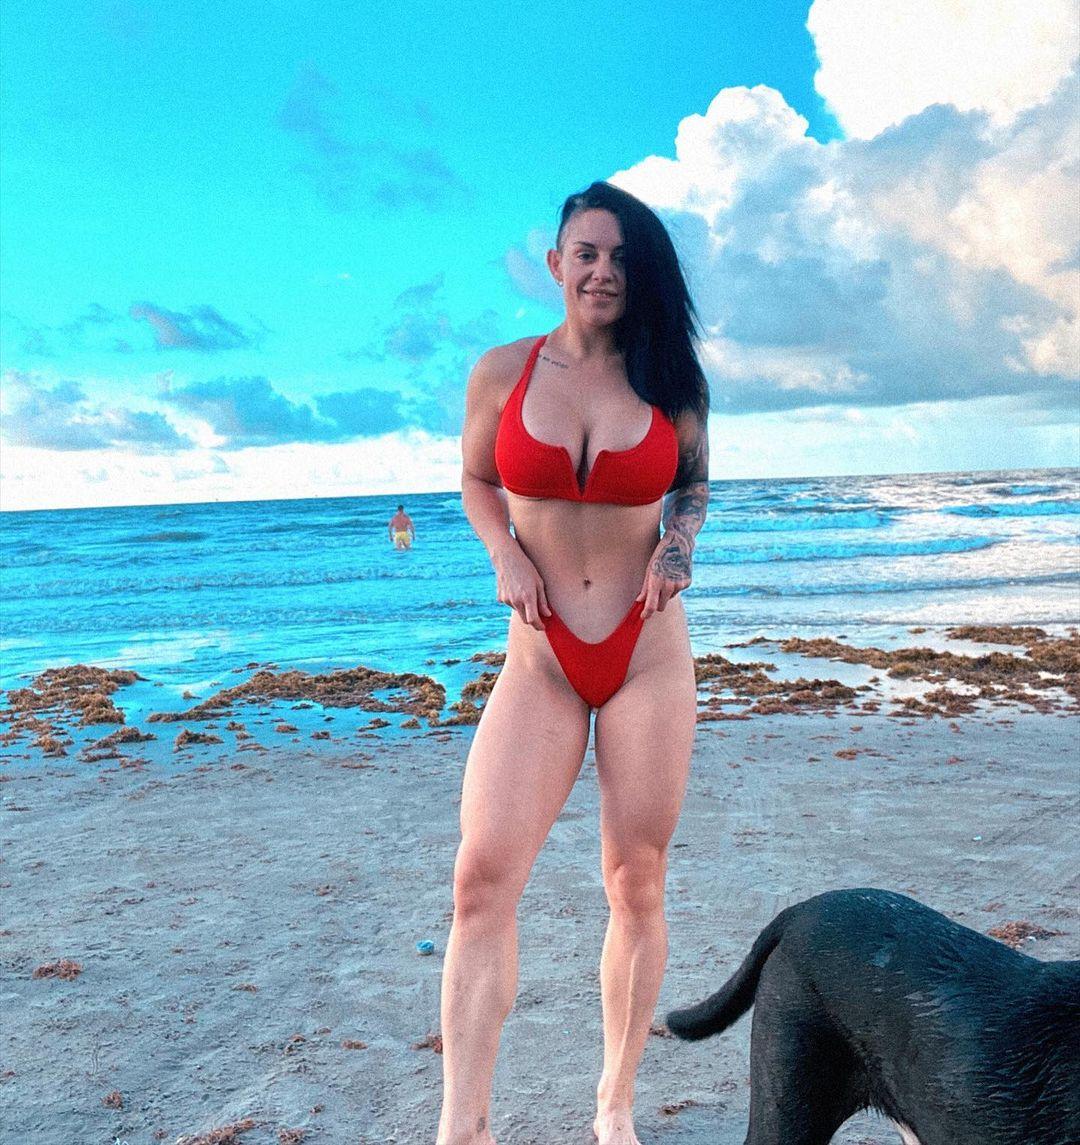 Celeste Bonin Nude Leaked The Fappening & Sexy 0003